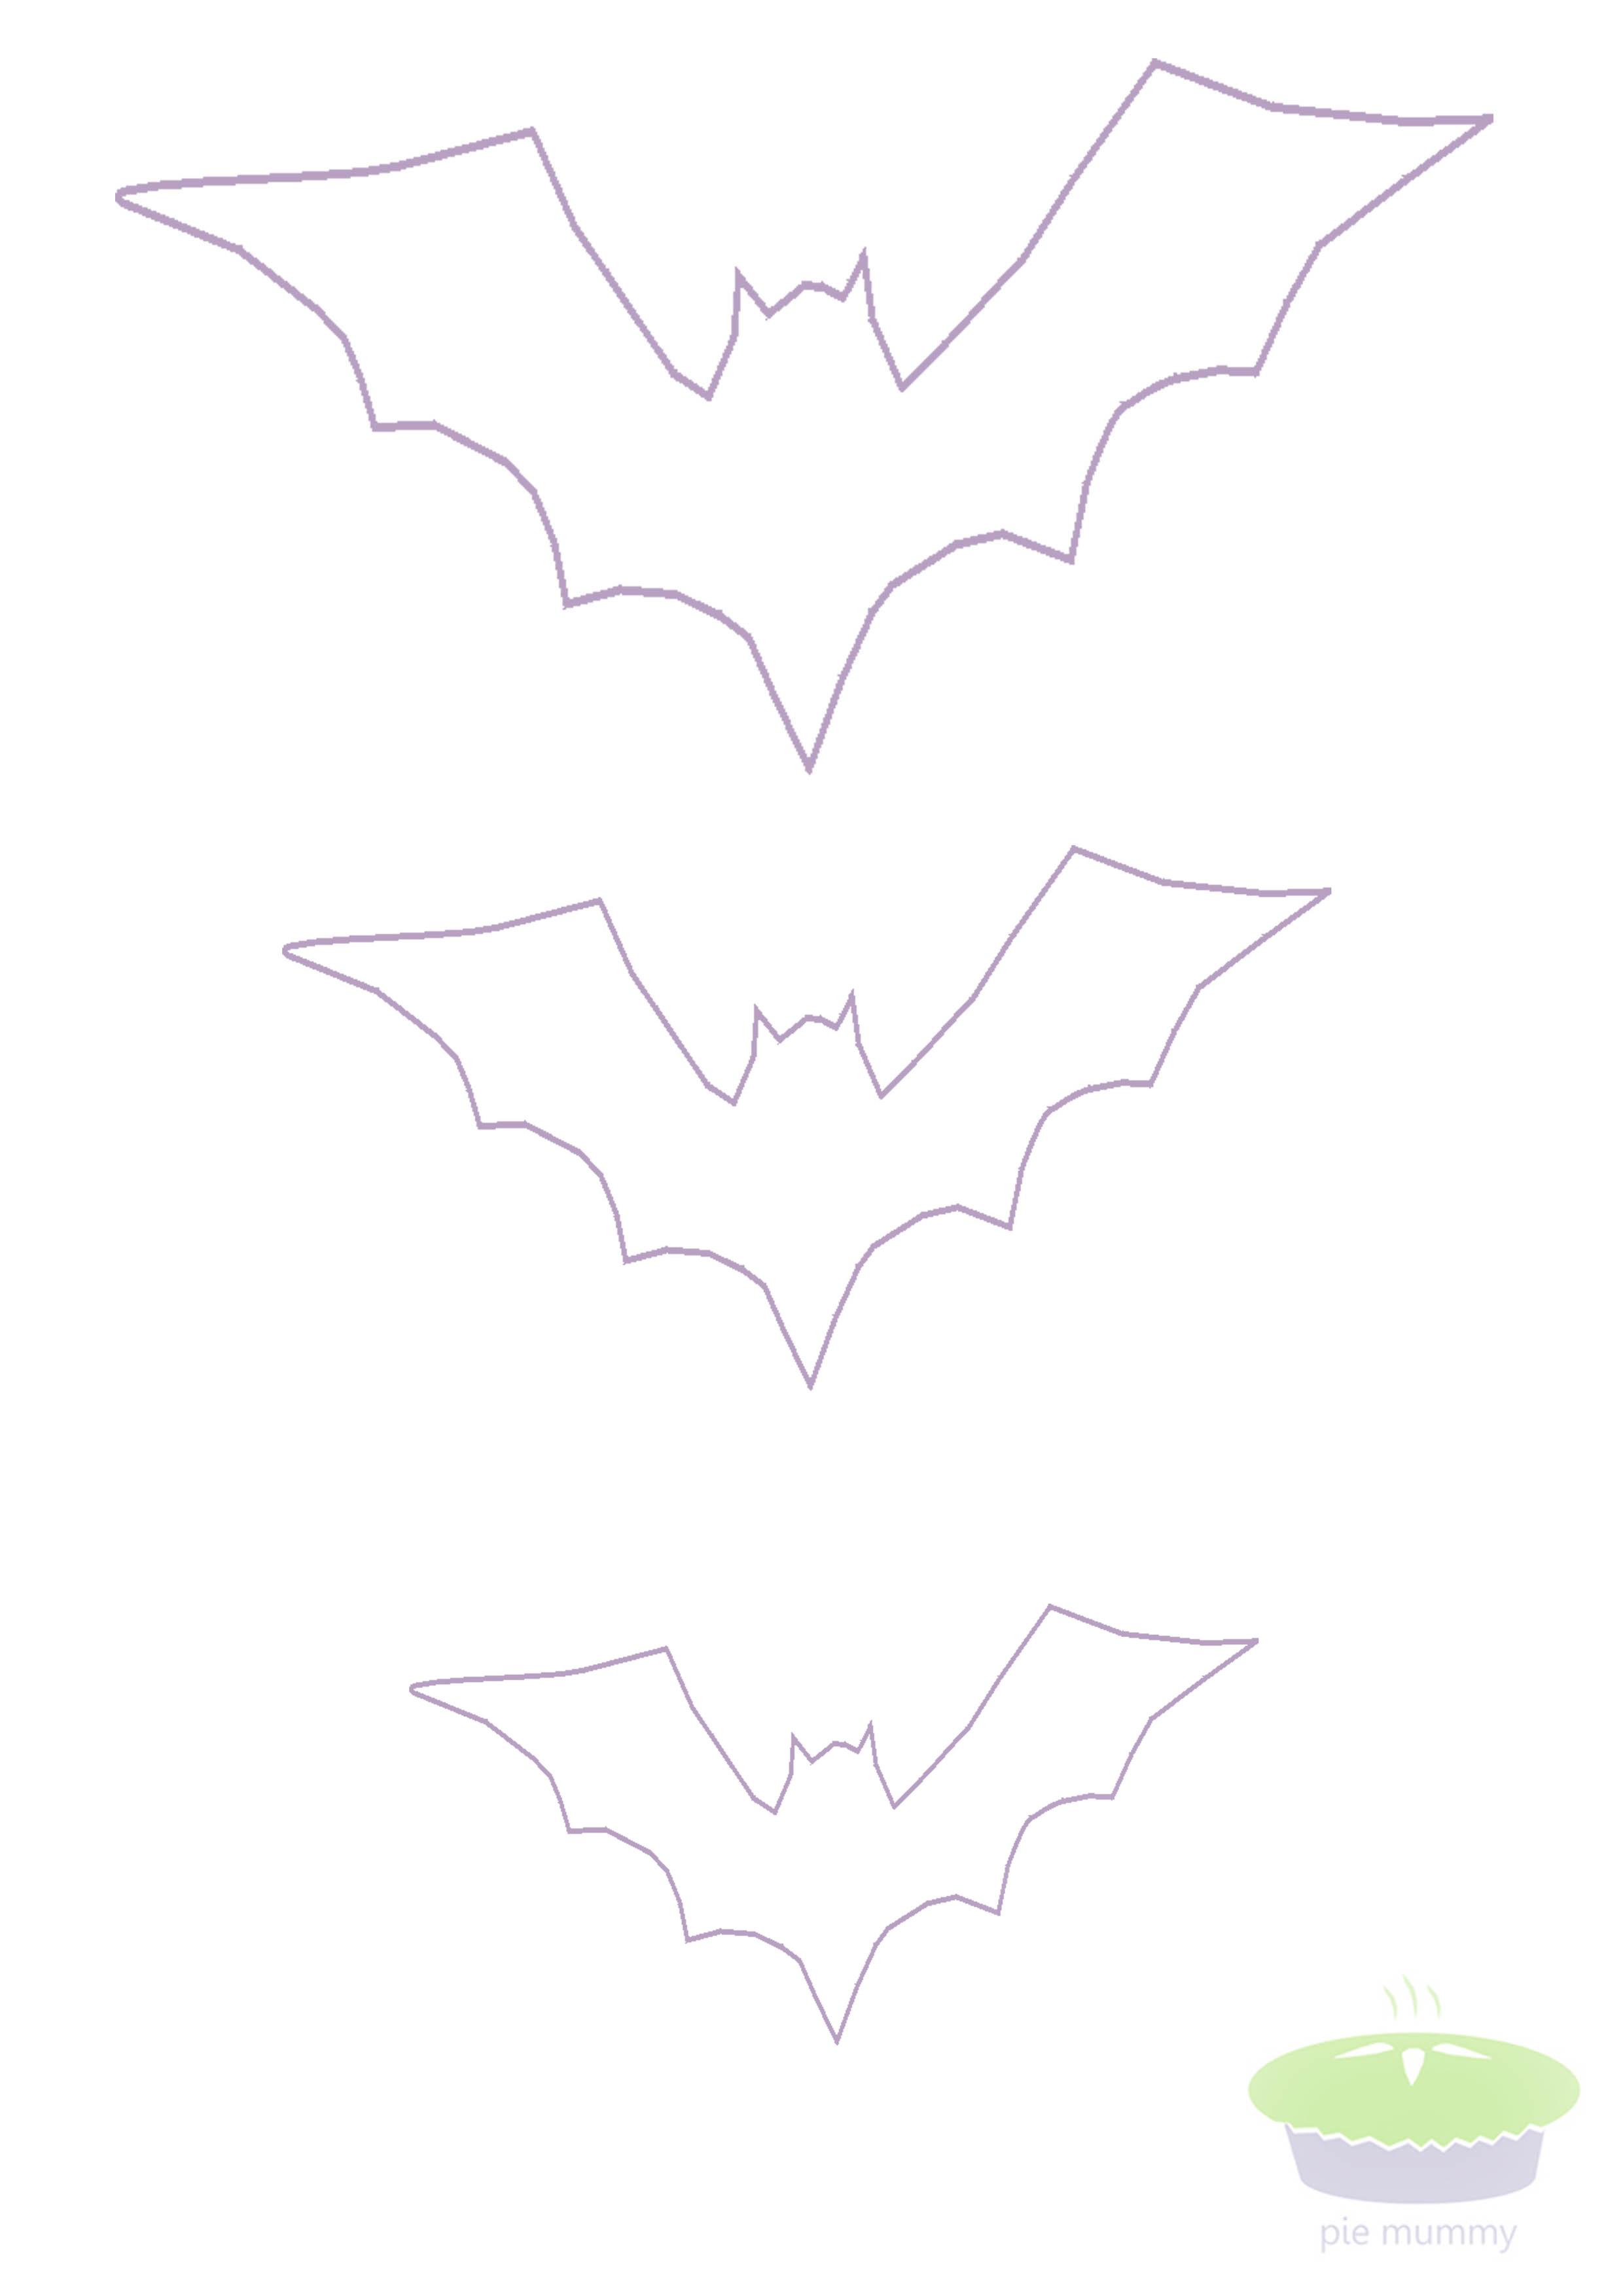 Fullsize Of Bat Cut Out